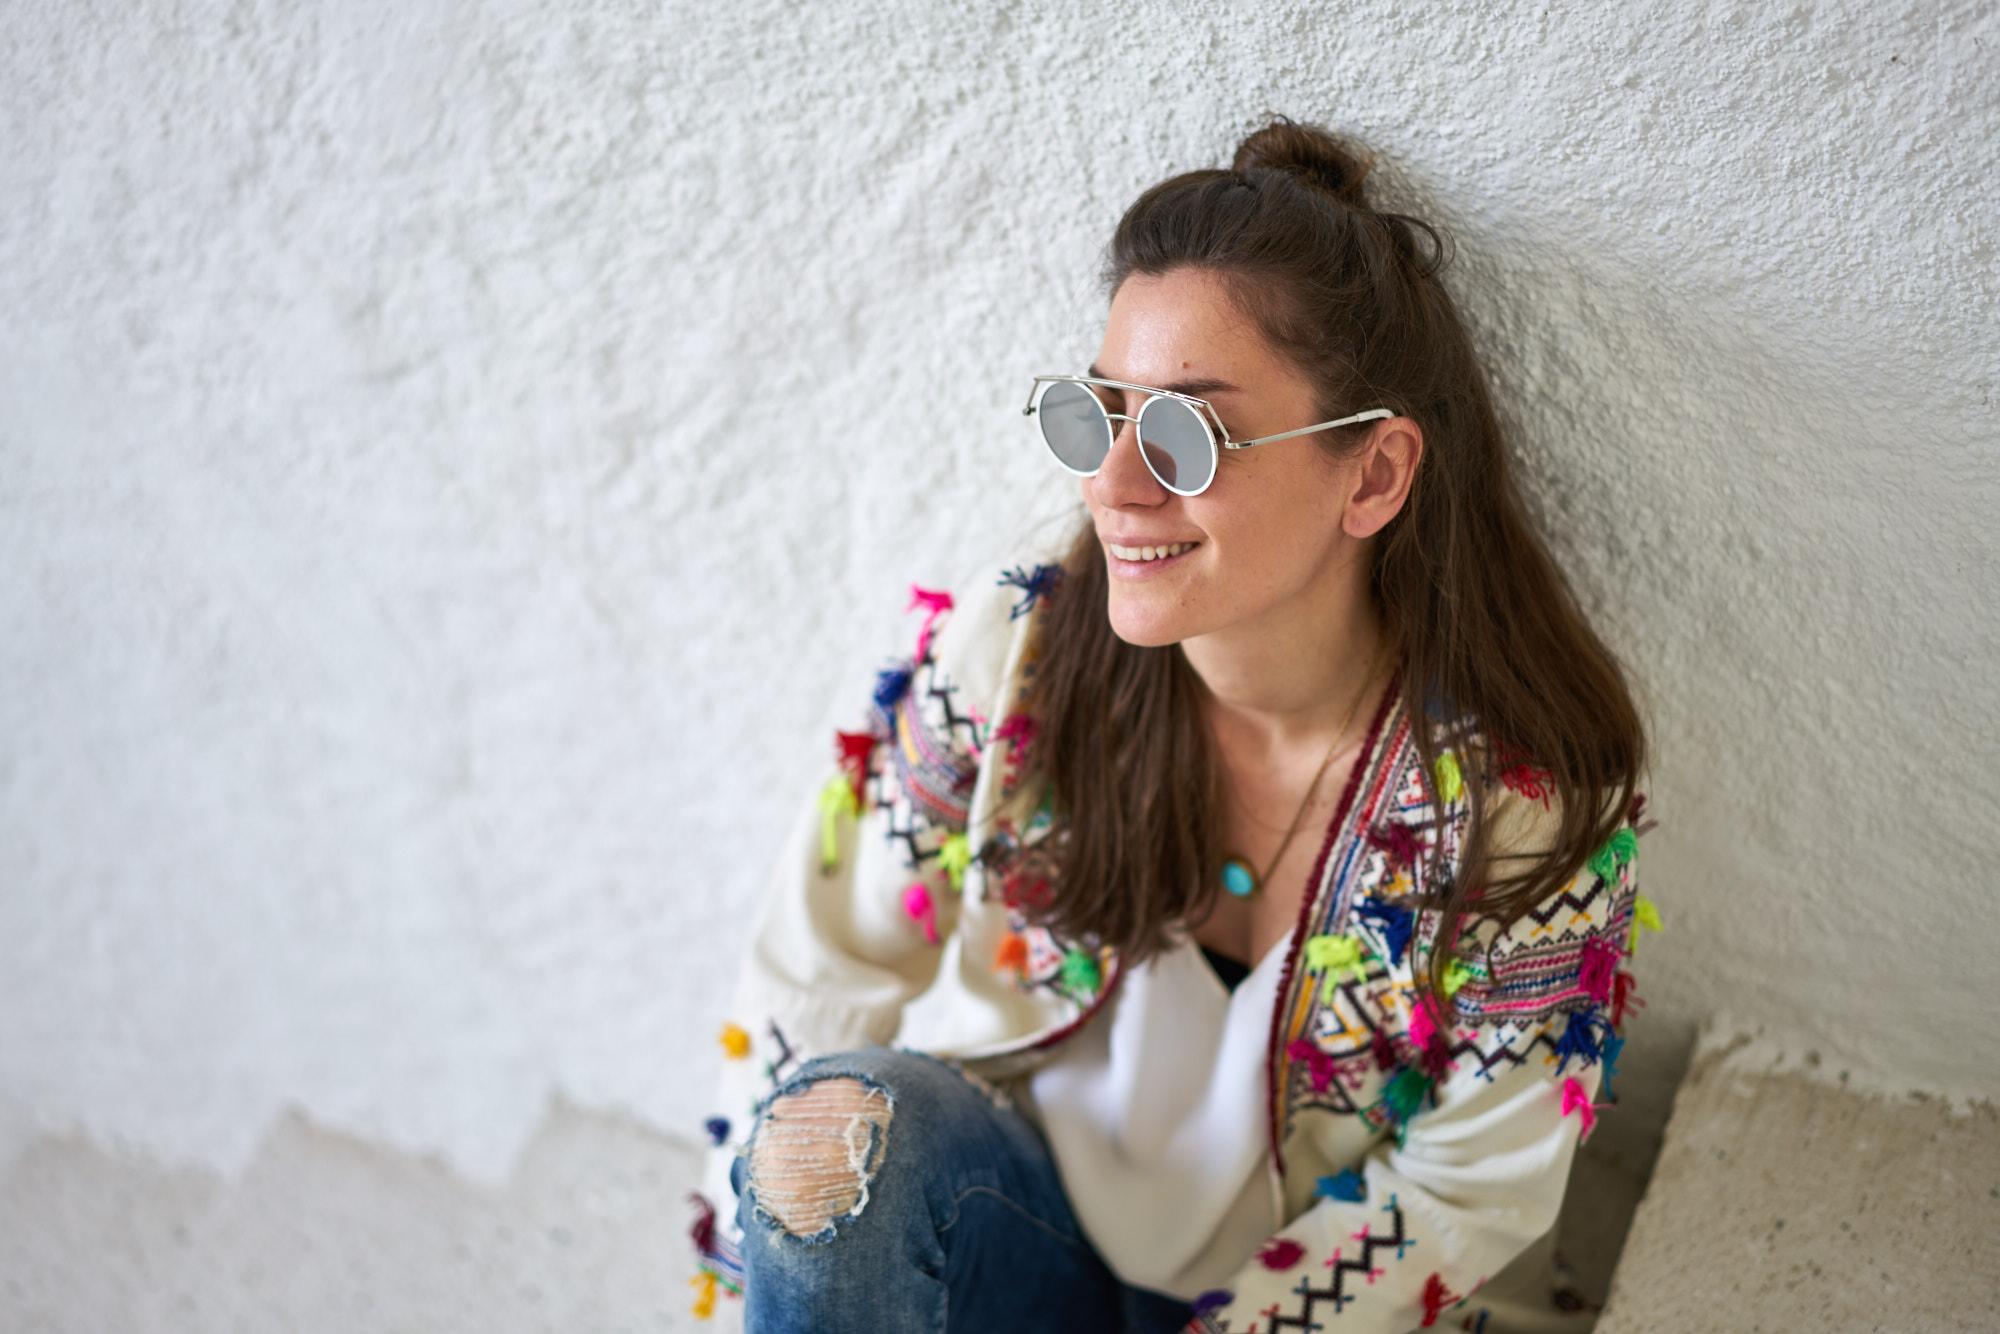 billur saatci, offnegiysem, street style, turkish style blogger, billurbasarontheway, offnereyegitsem,youtube